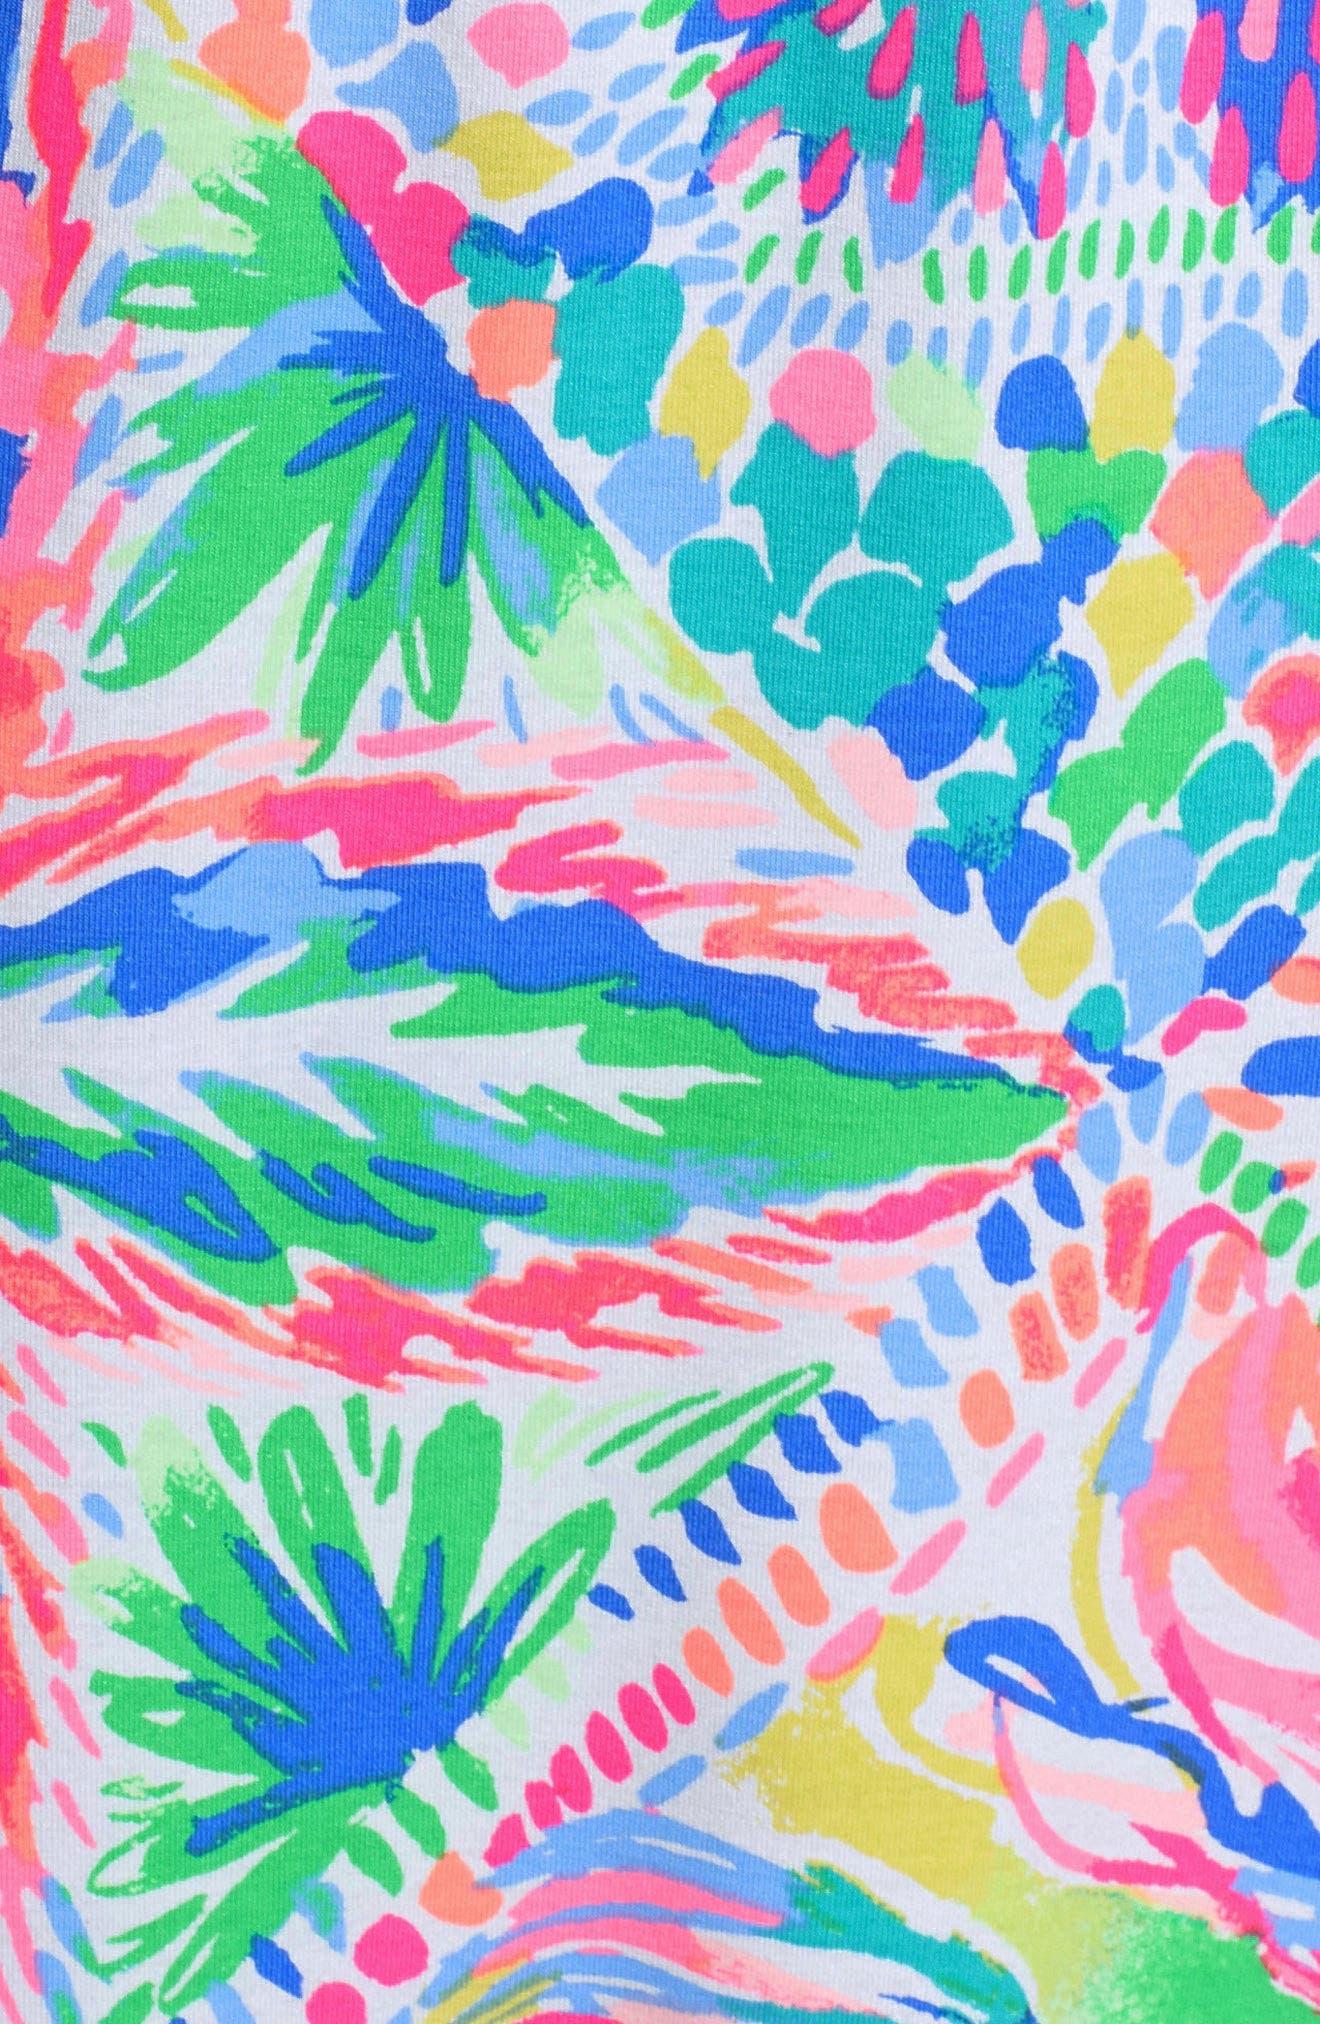 Marlisa Maxi Dress,                             Alternate thumbnail 6, color,                             MULTI DANCING ON THE DECK